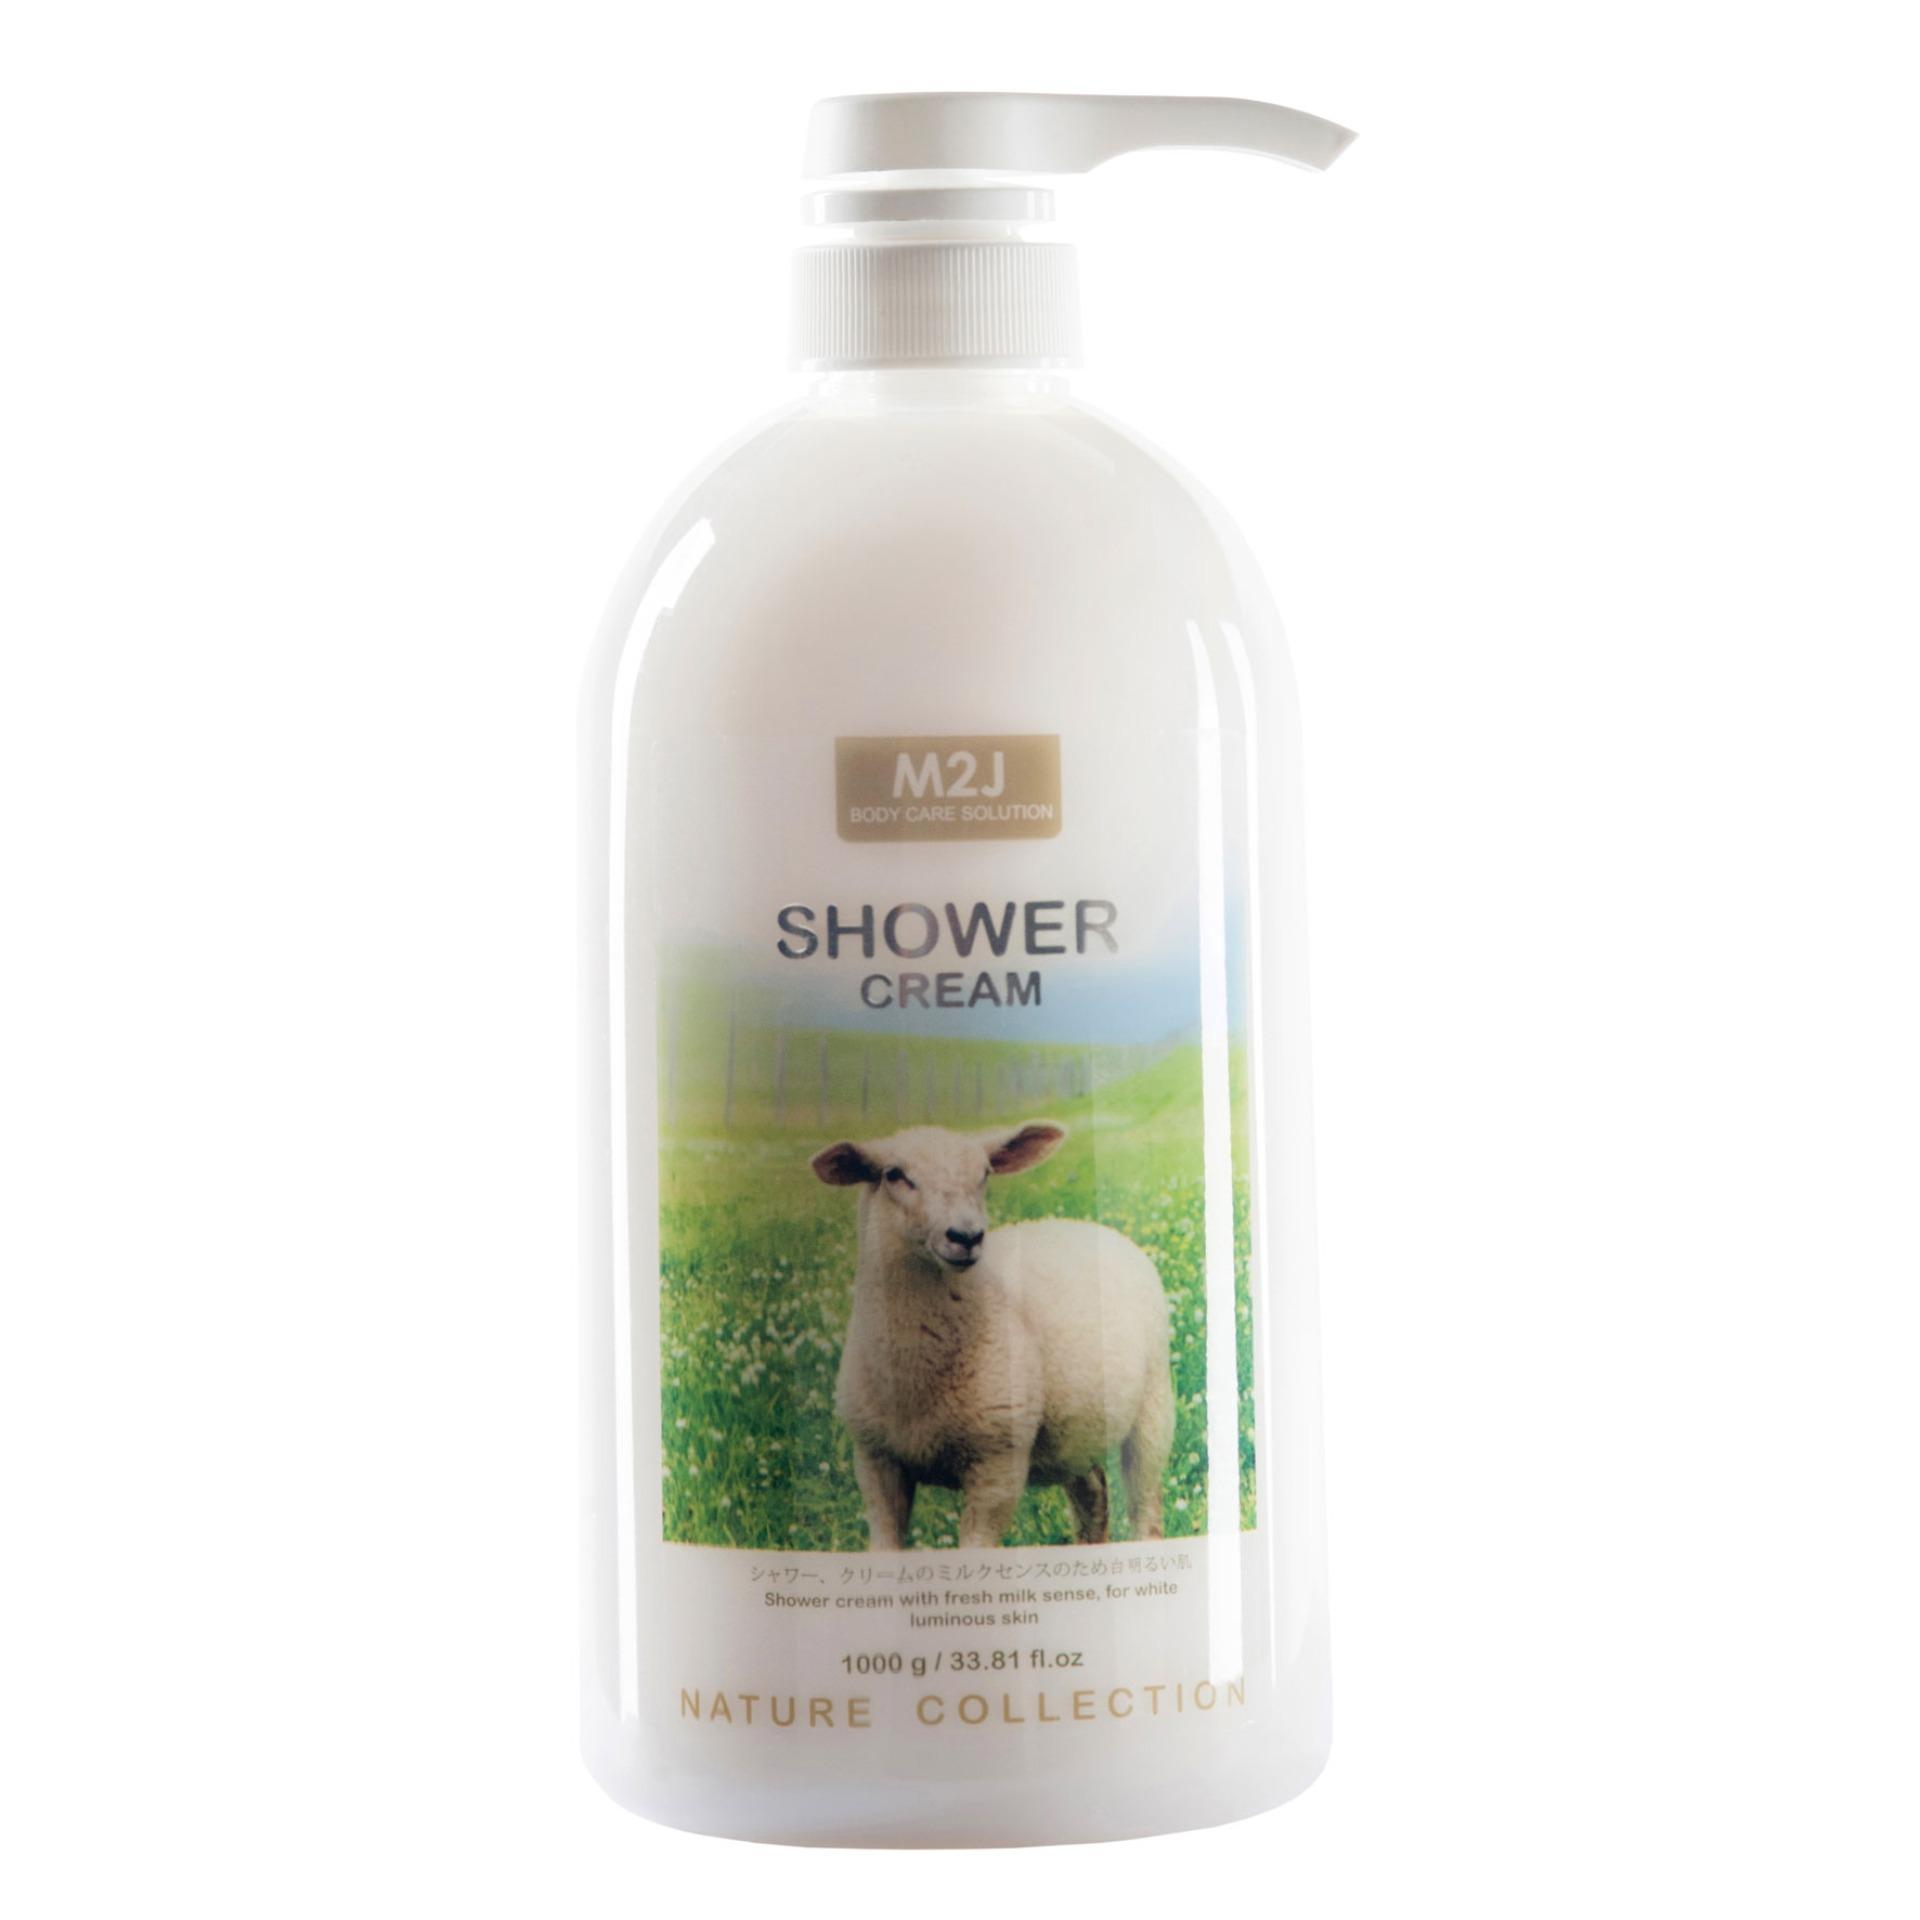 M2J Shower Cream - 1000 g